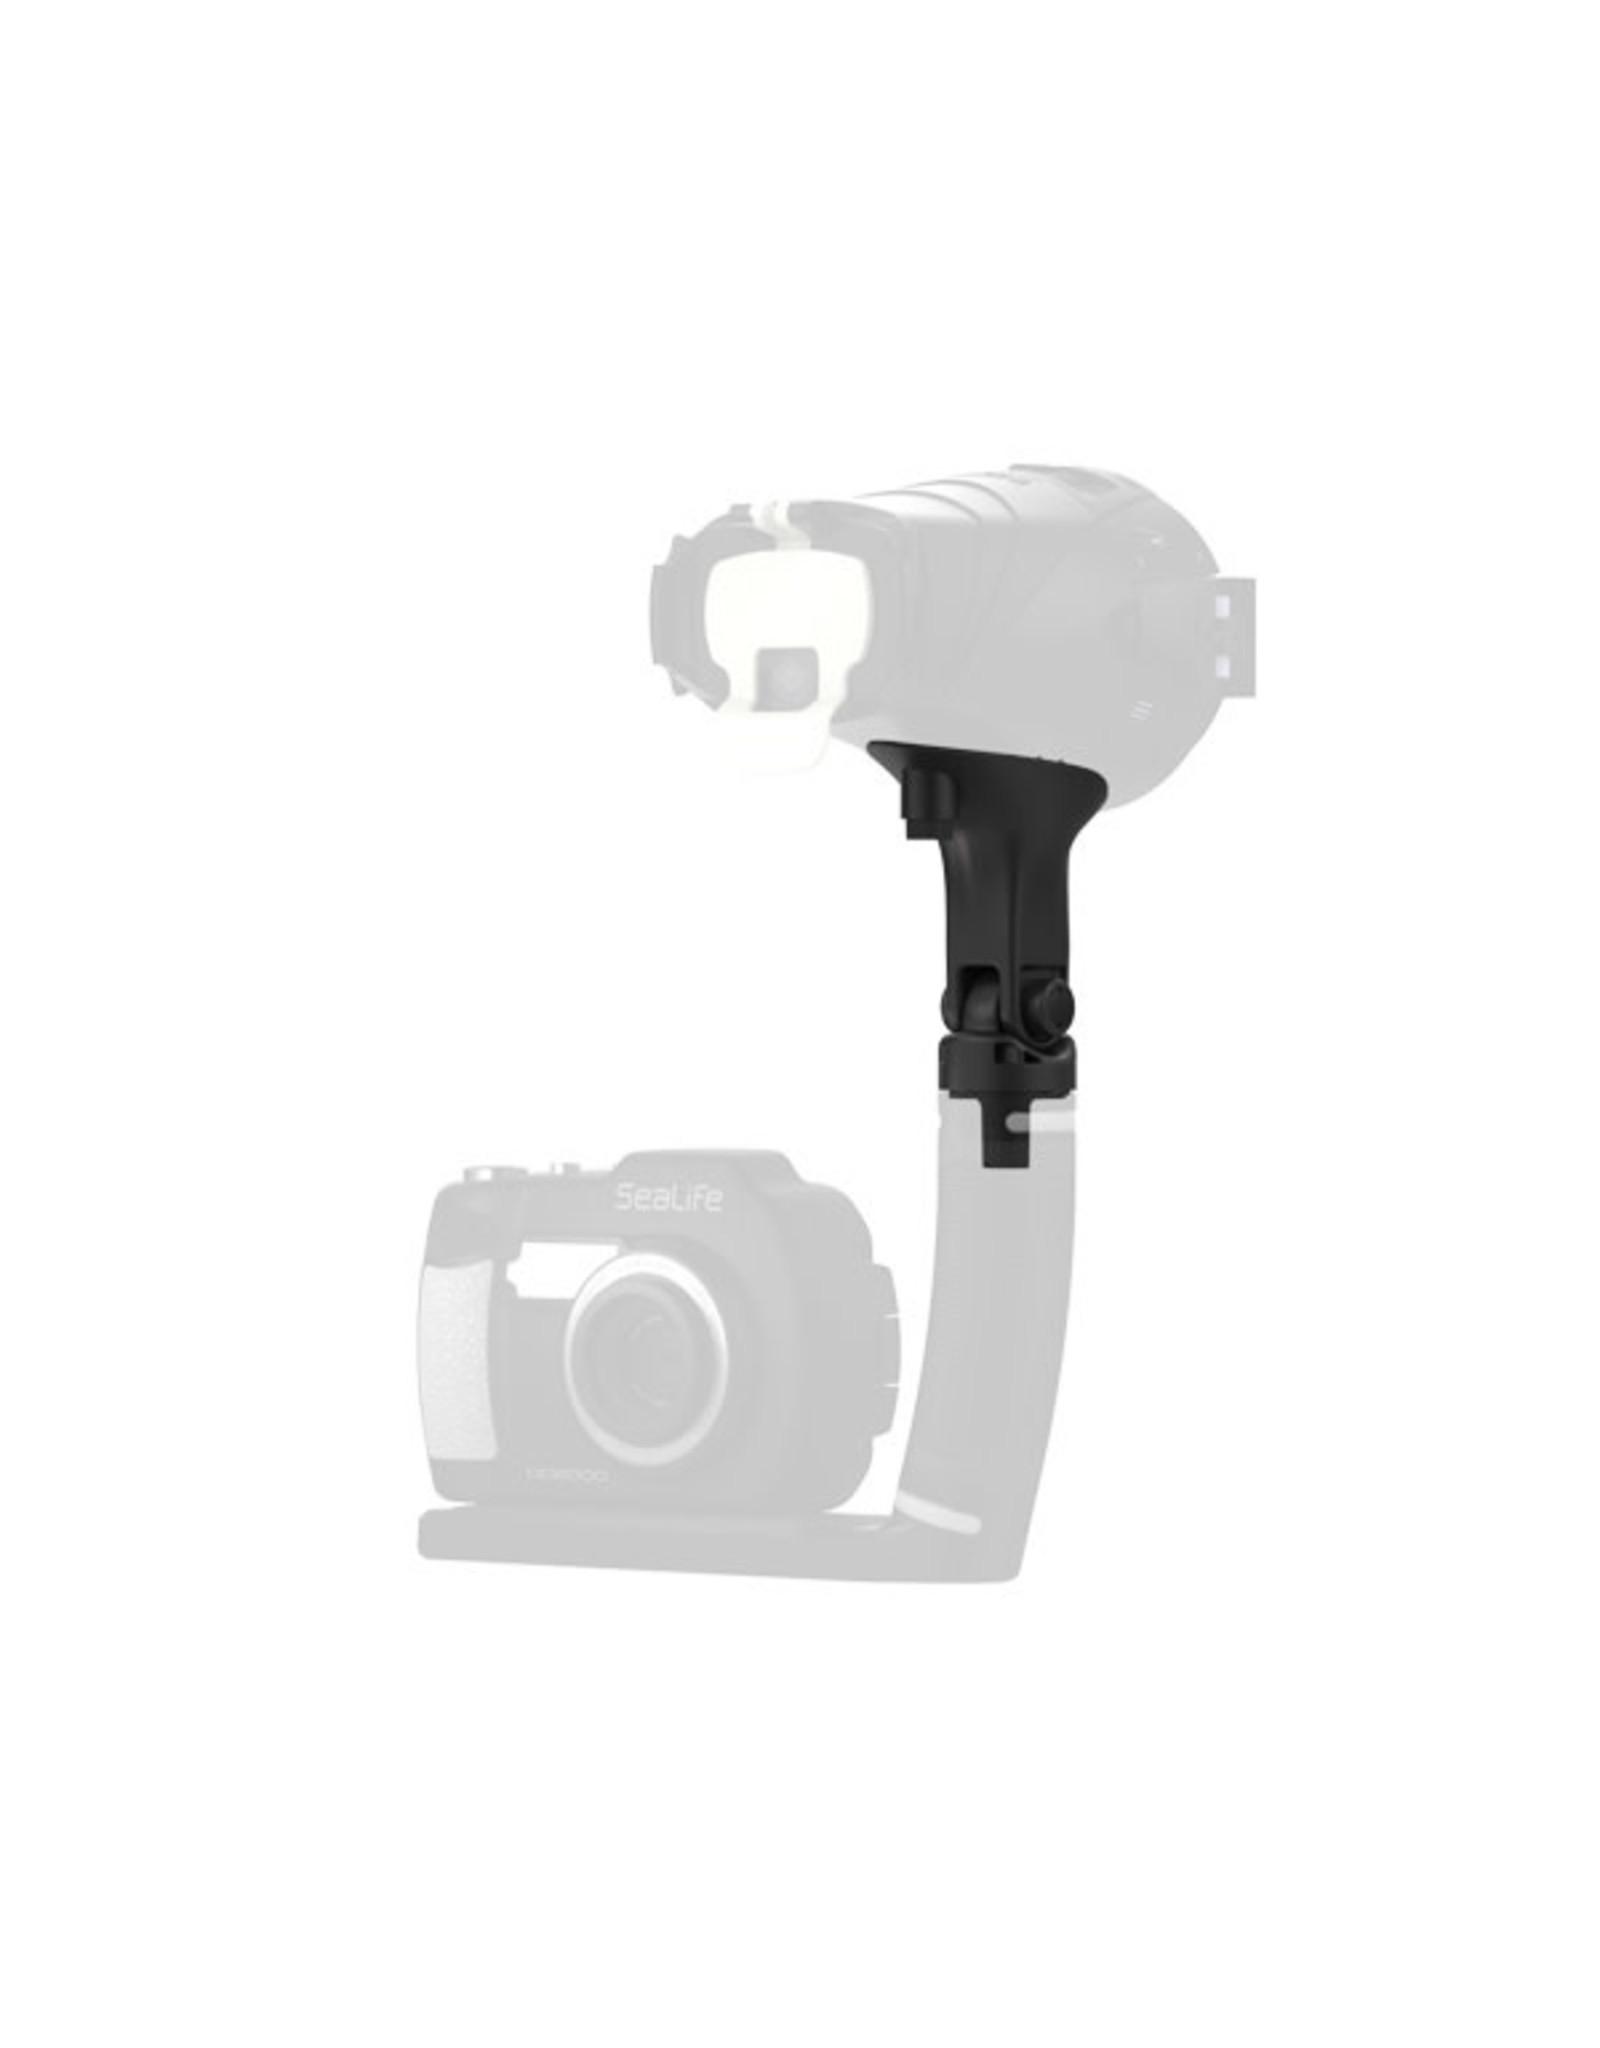 Sealife Sealife Flex-Connect Digital Pro Flash Adapter